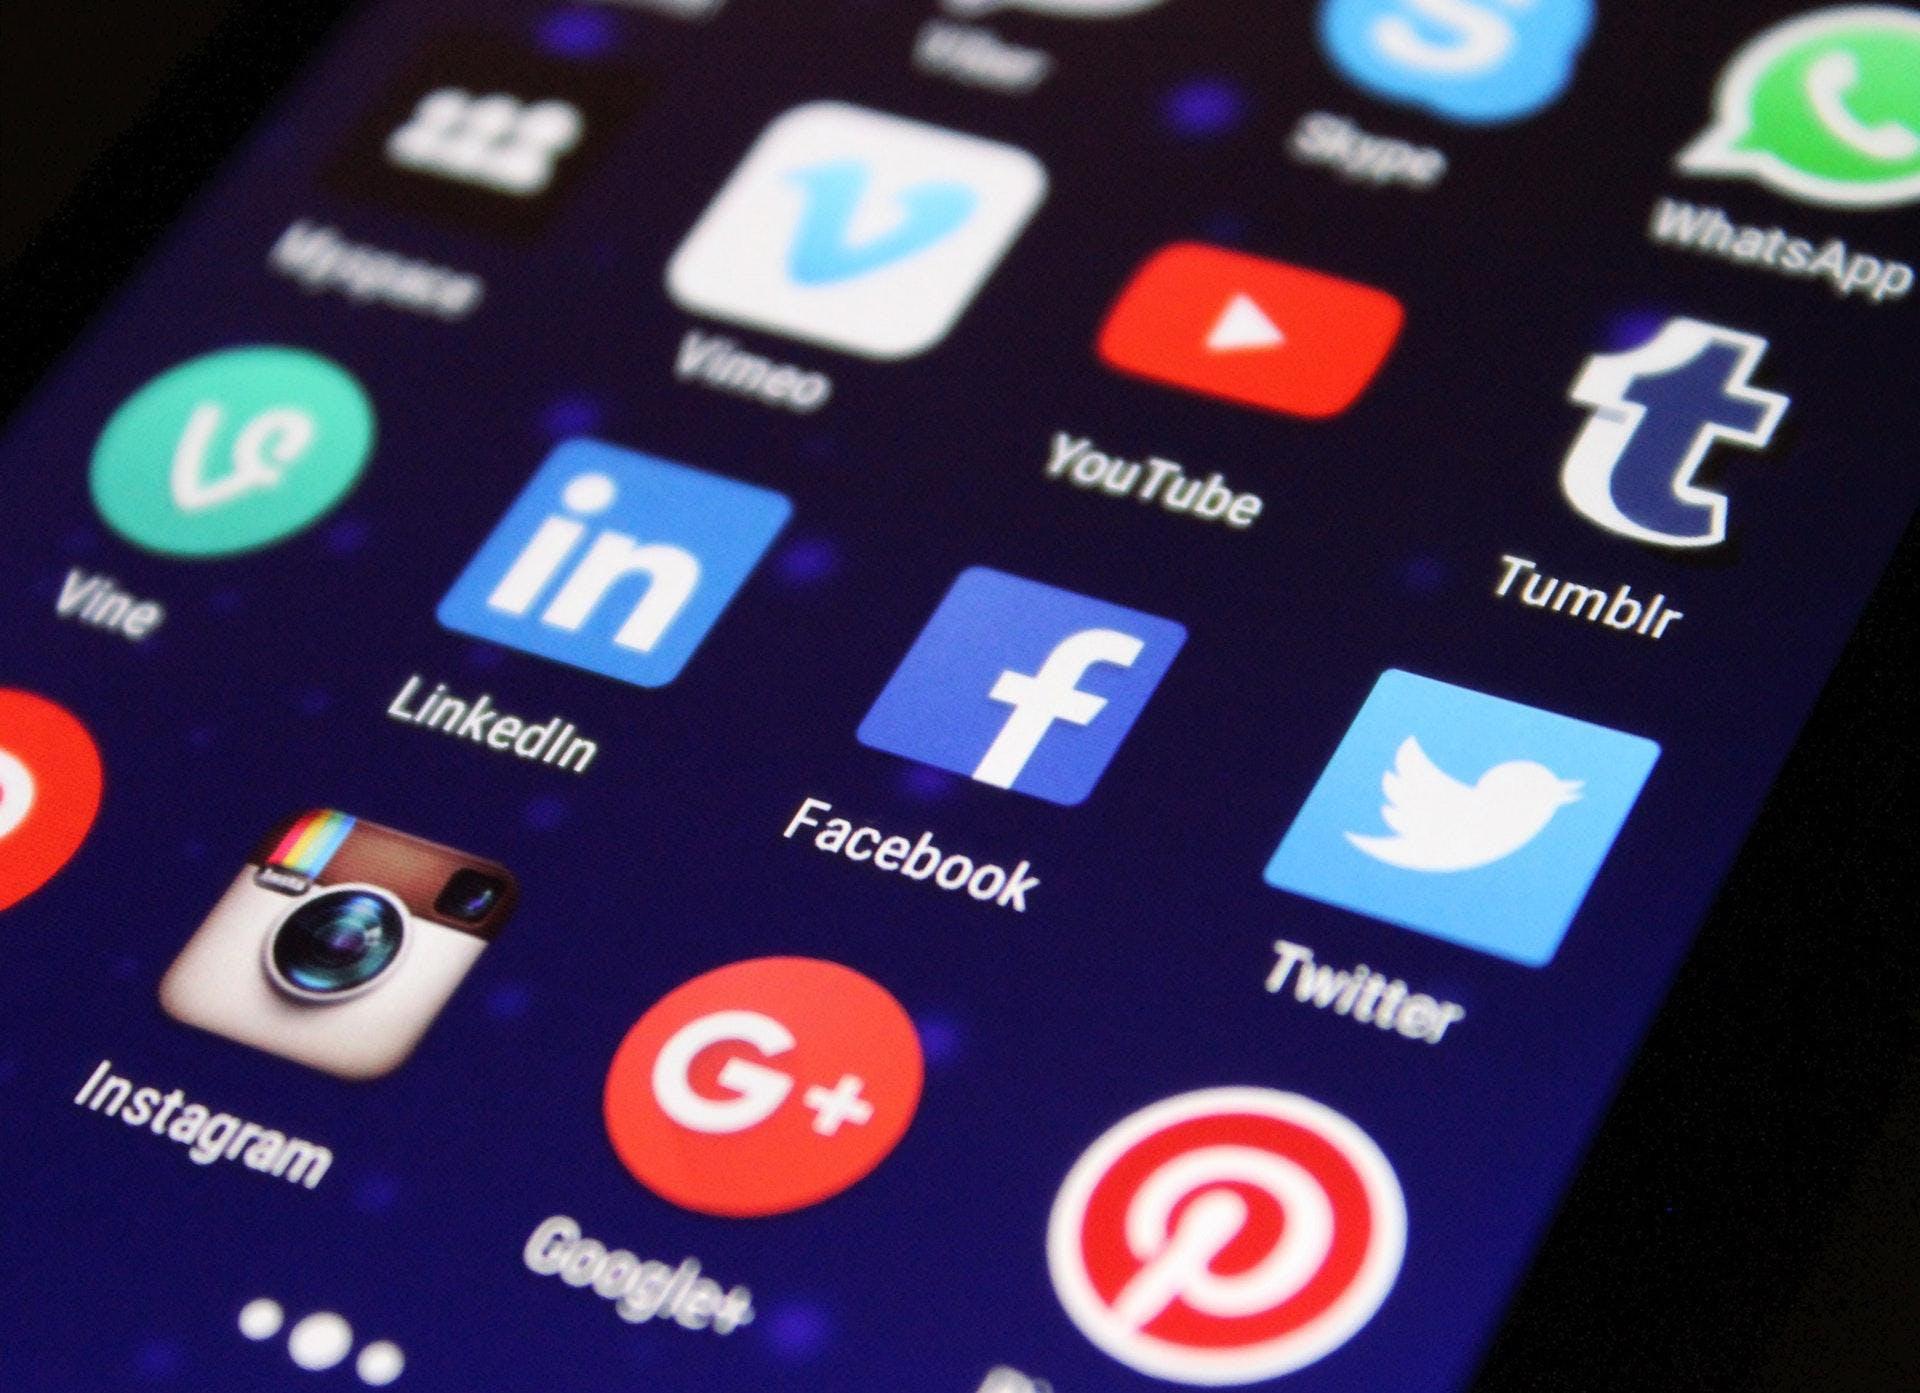 [SKILLFUTURE CLAIMABLE] Social Media Marketing